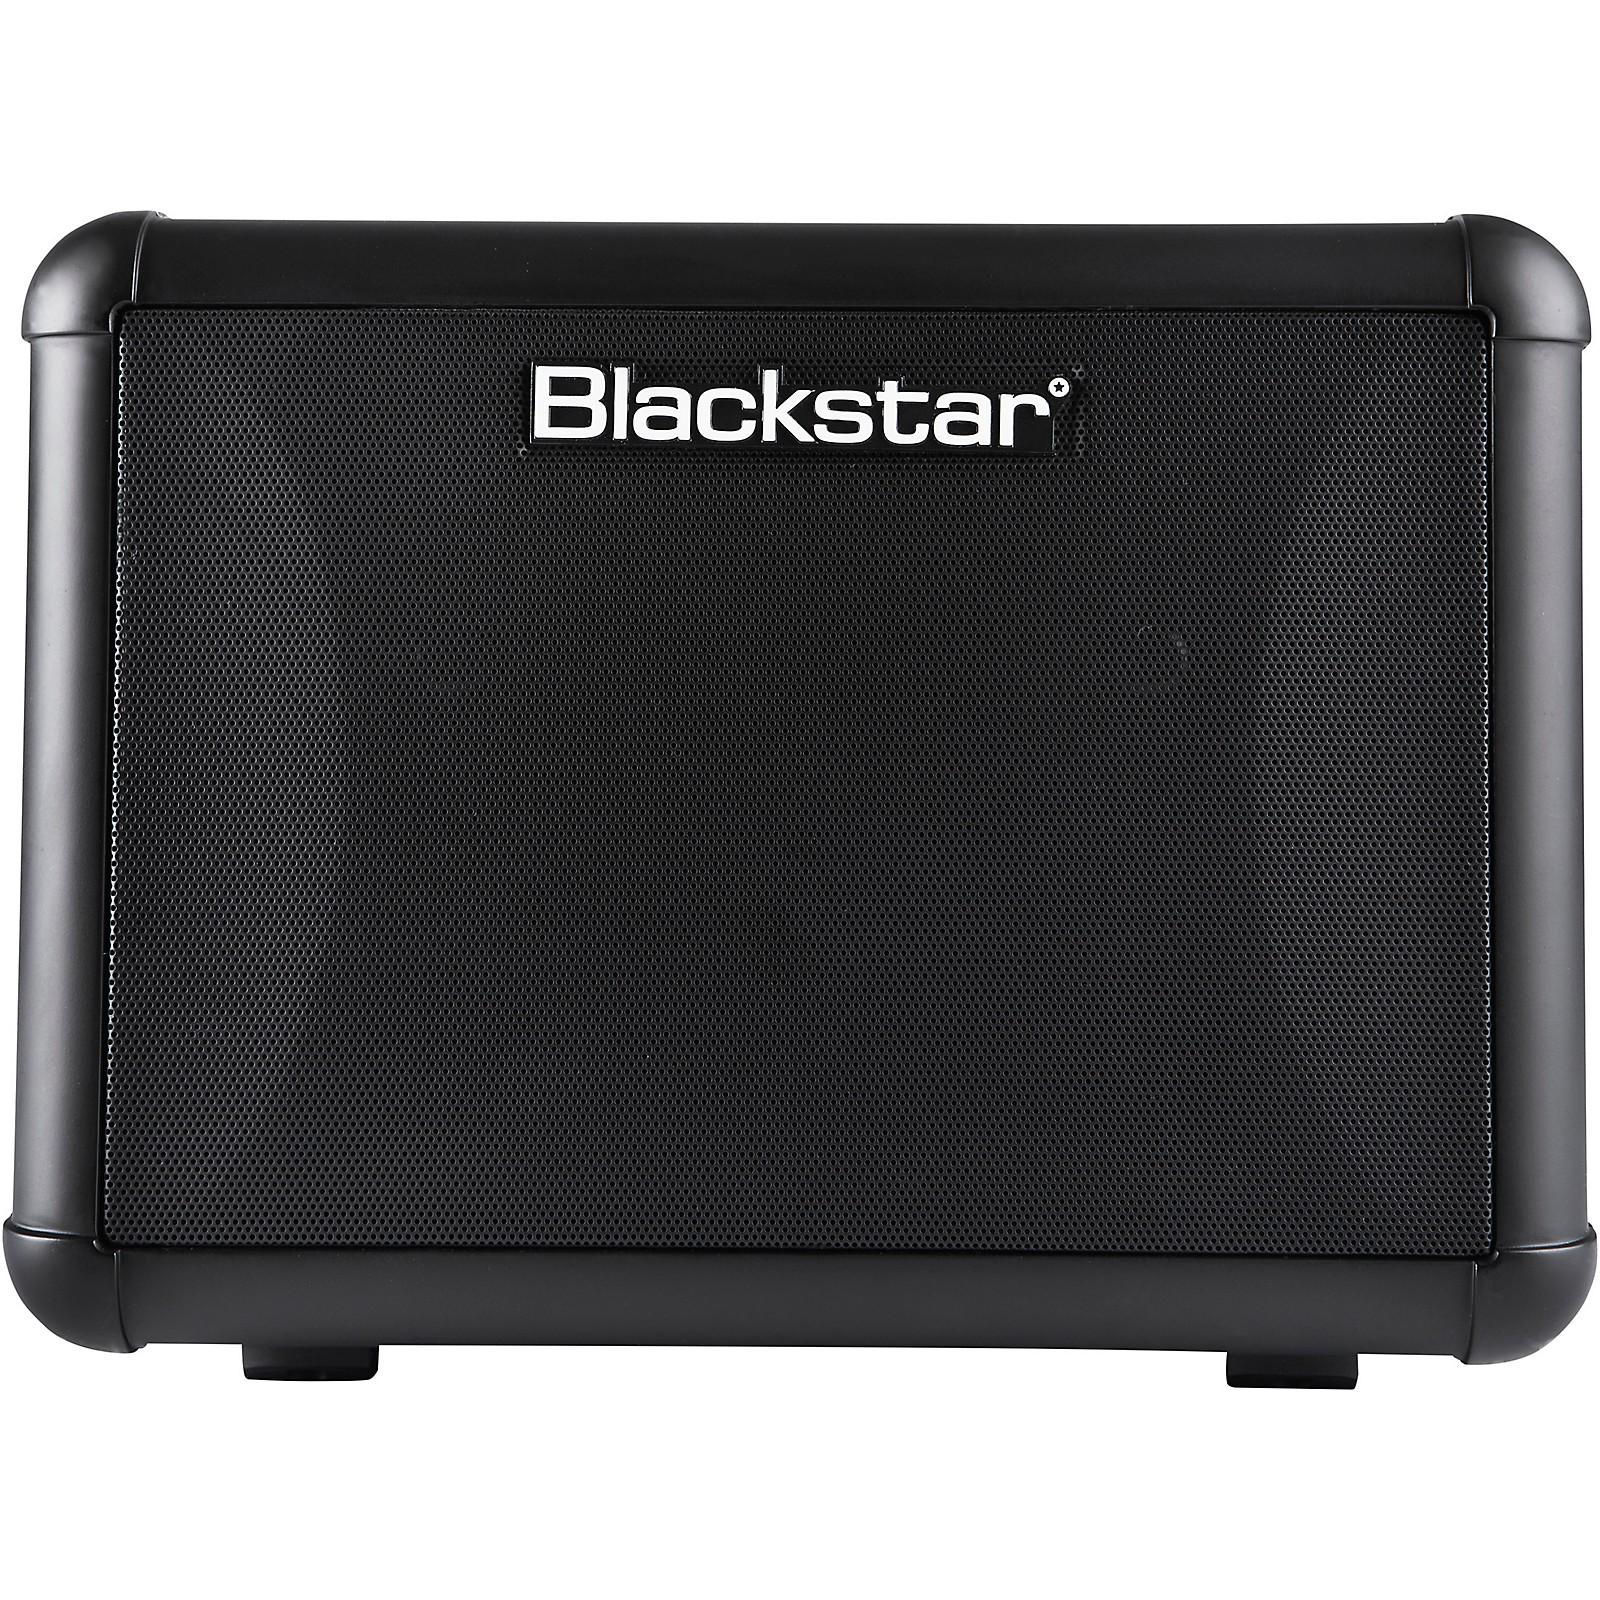 Open Box Blackstar Super Fly Act 12W 2x3